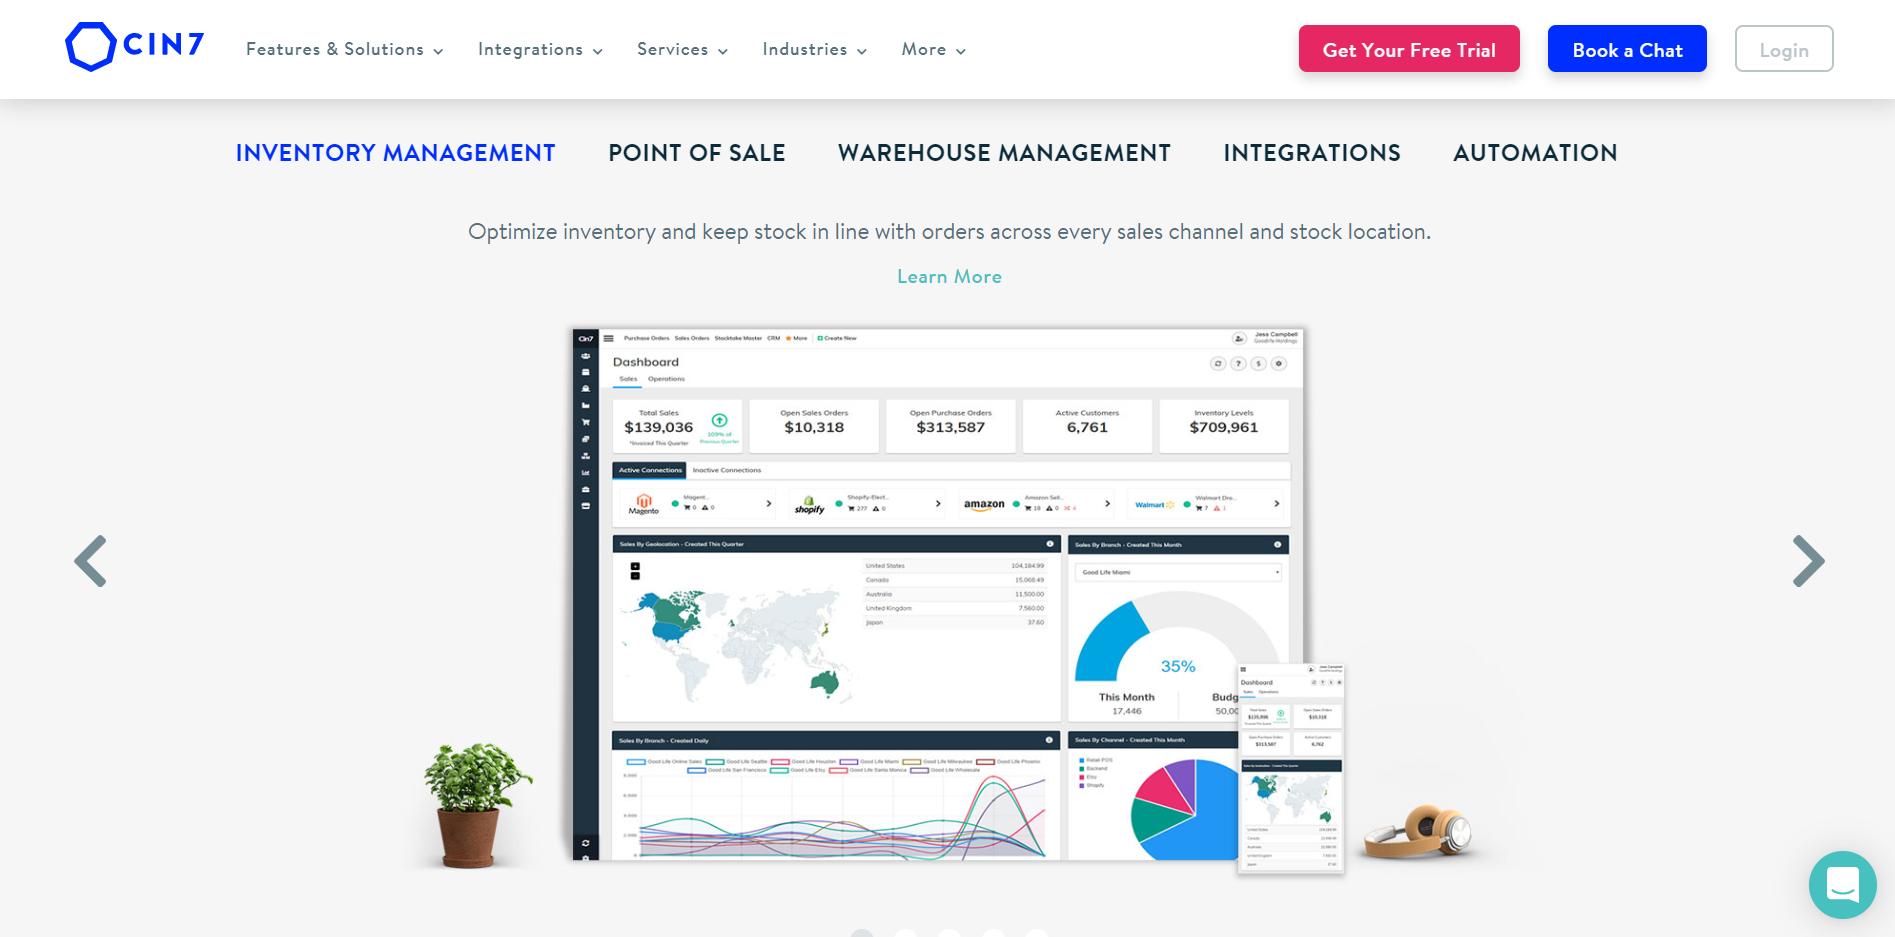 cin7 inventory management software